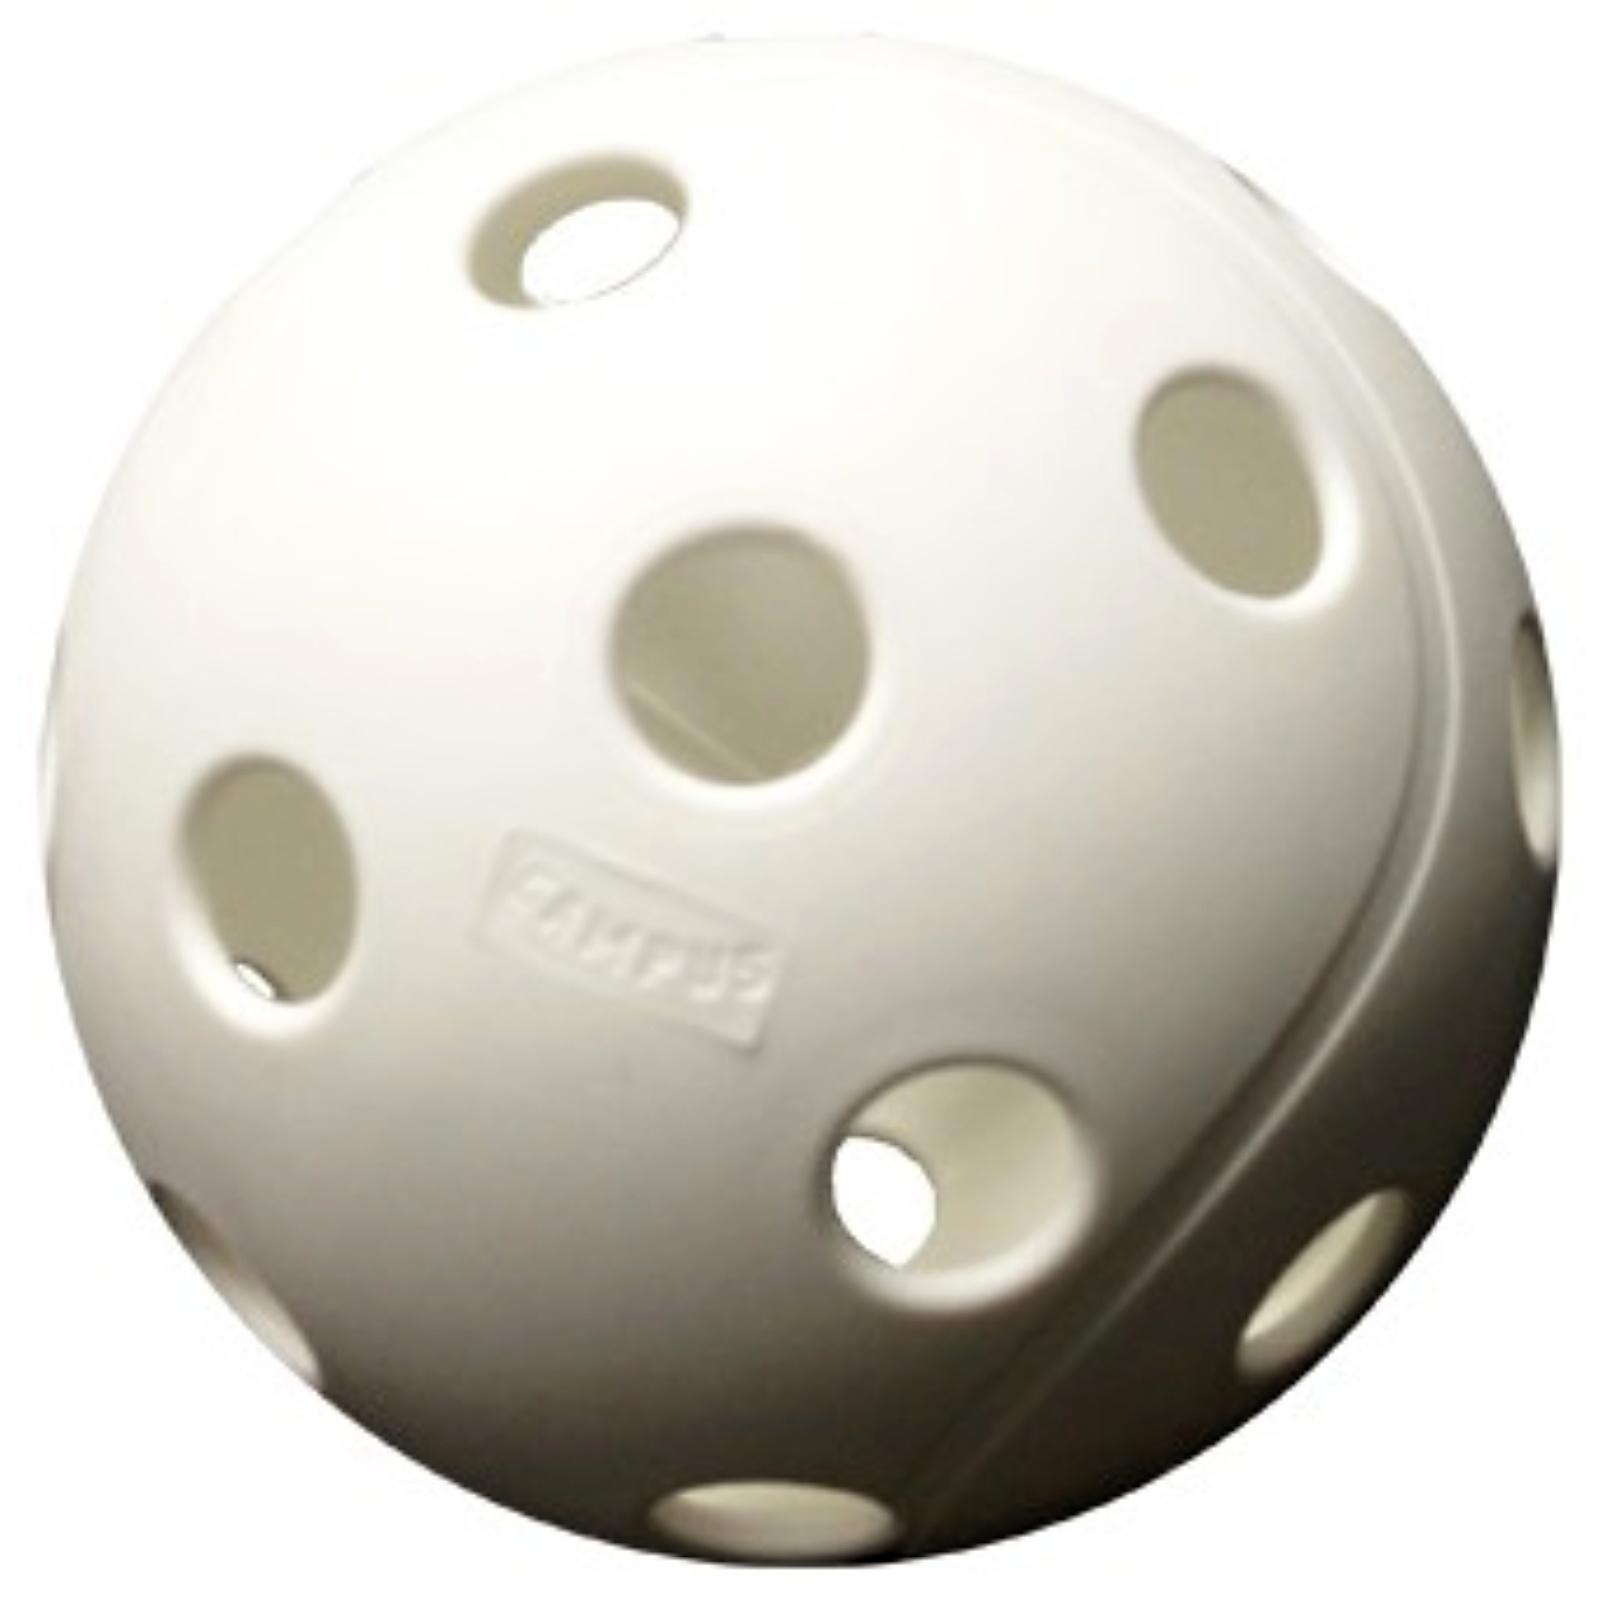 Florbalový míček SALMING X3M Campus Ball bílé, 10 ks